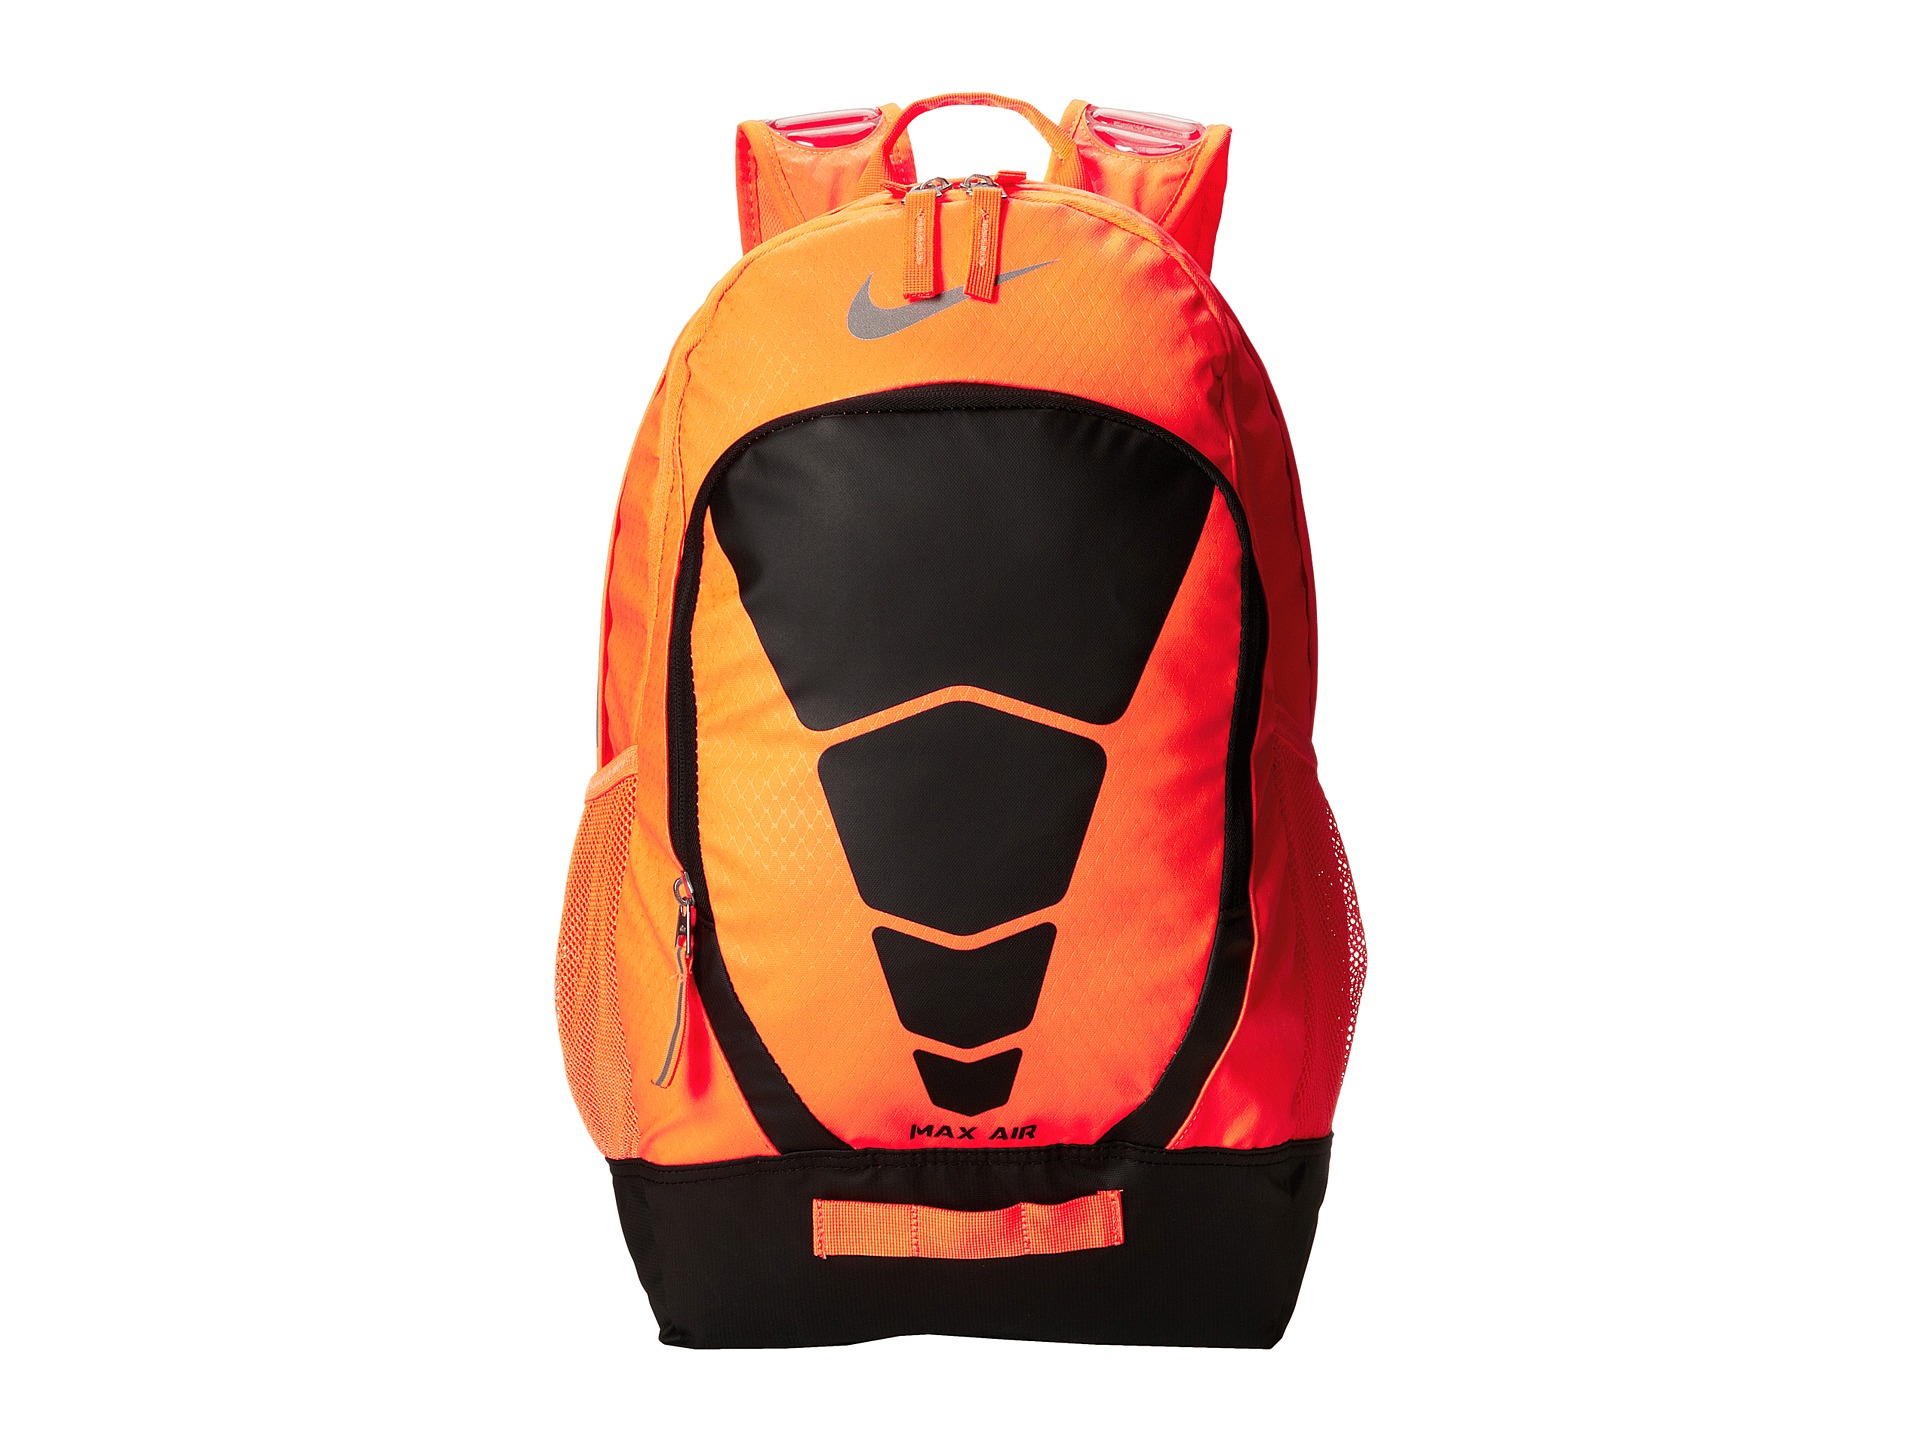 nike max air vapor backpack orange